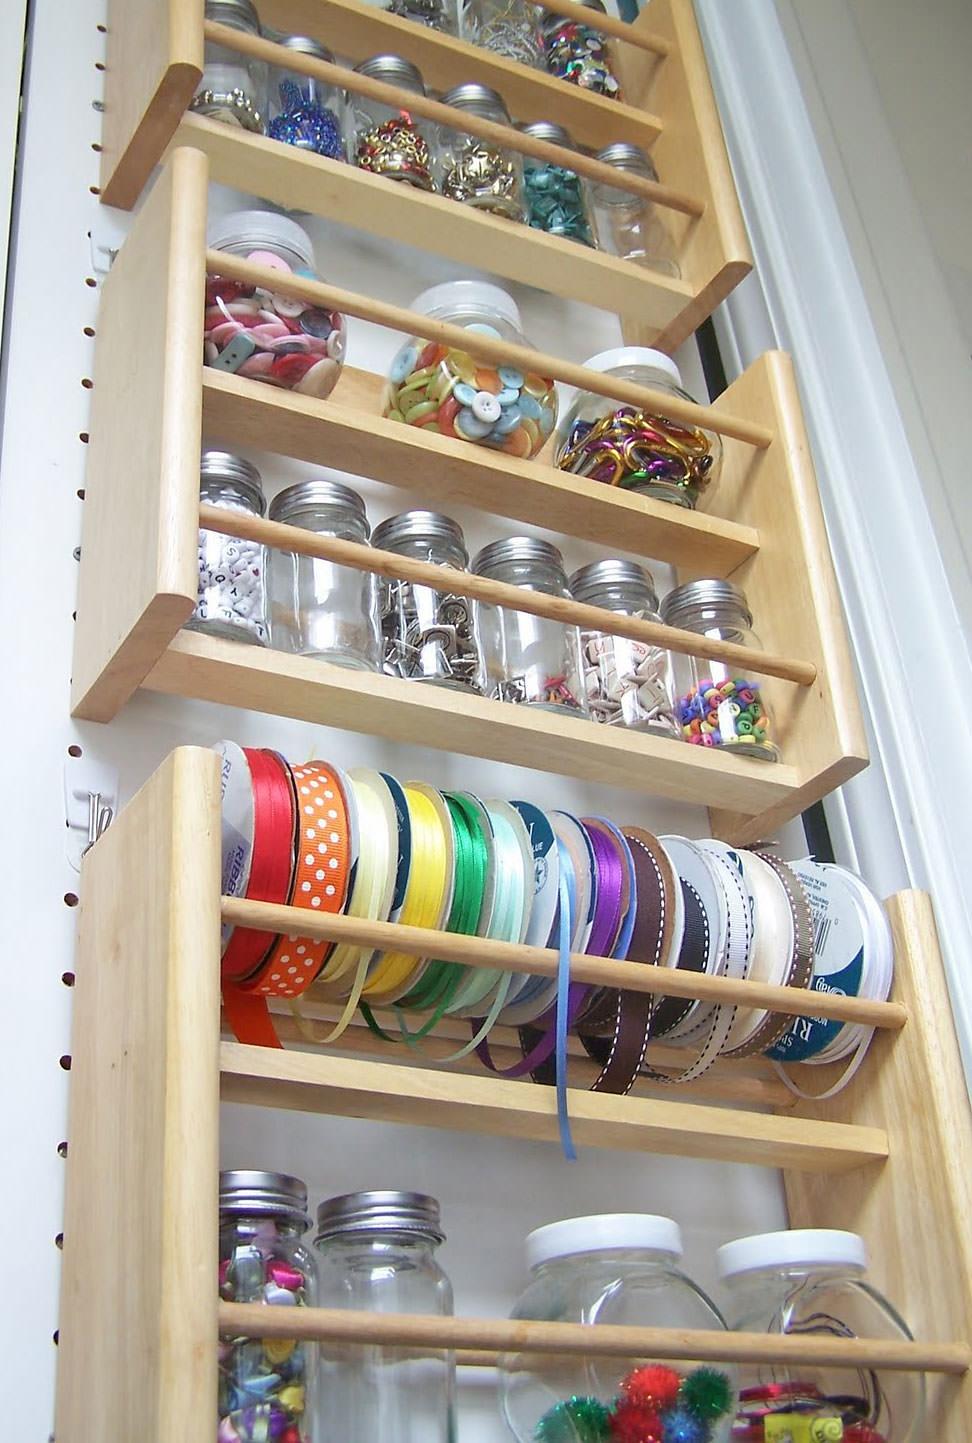 DIY-Craft-Room-Ideas-Projects-1000-1.jpg